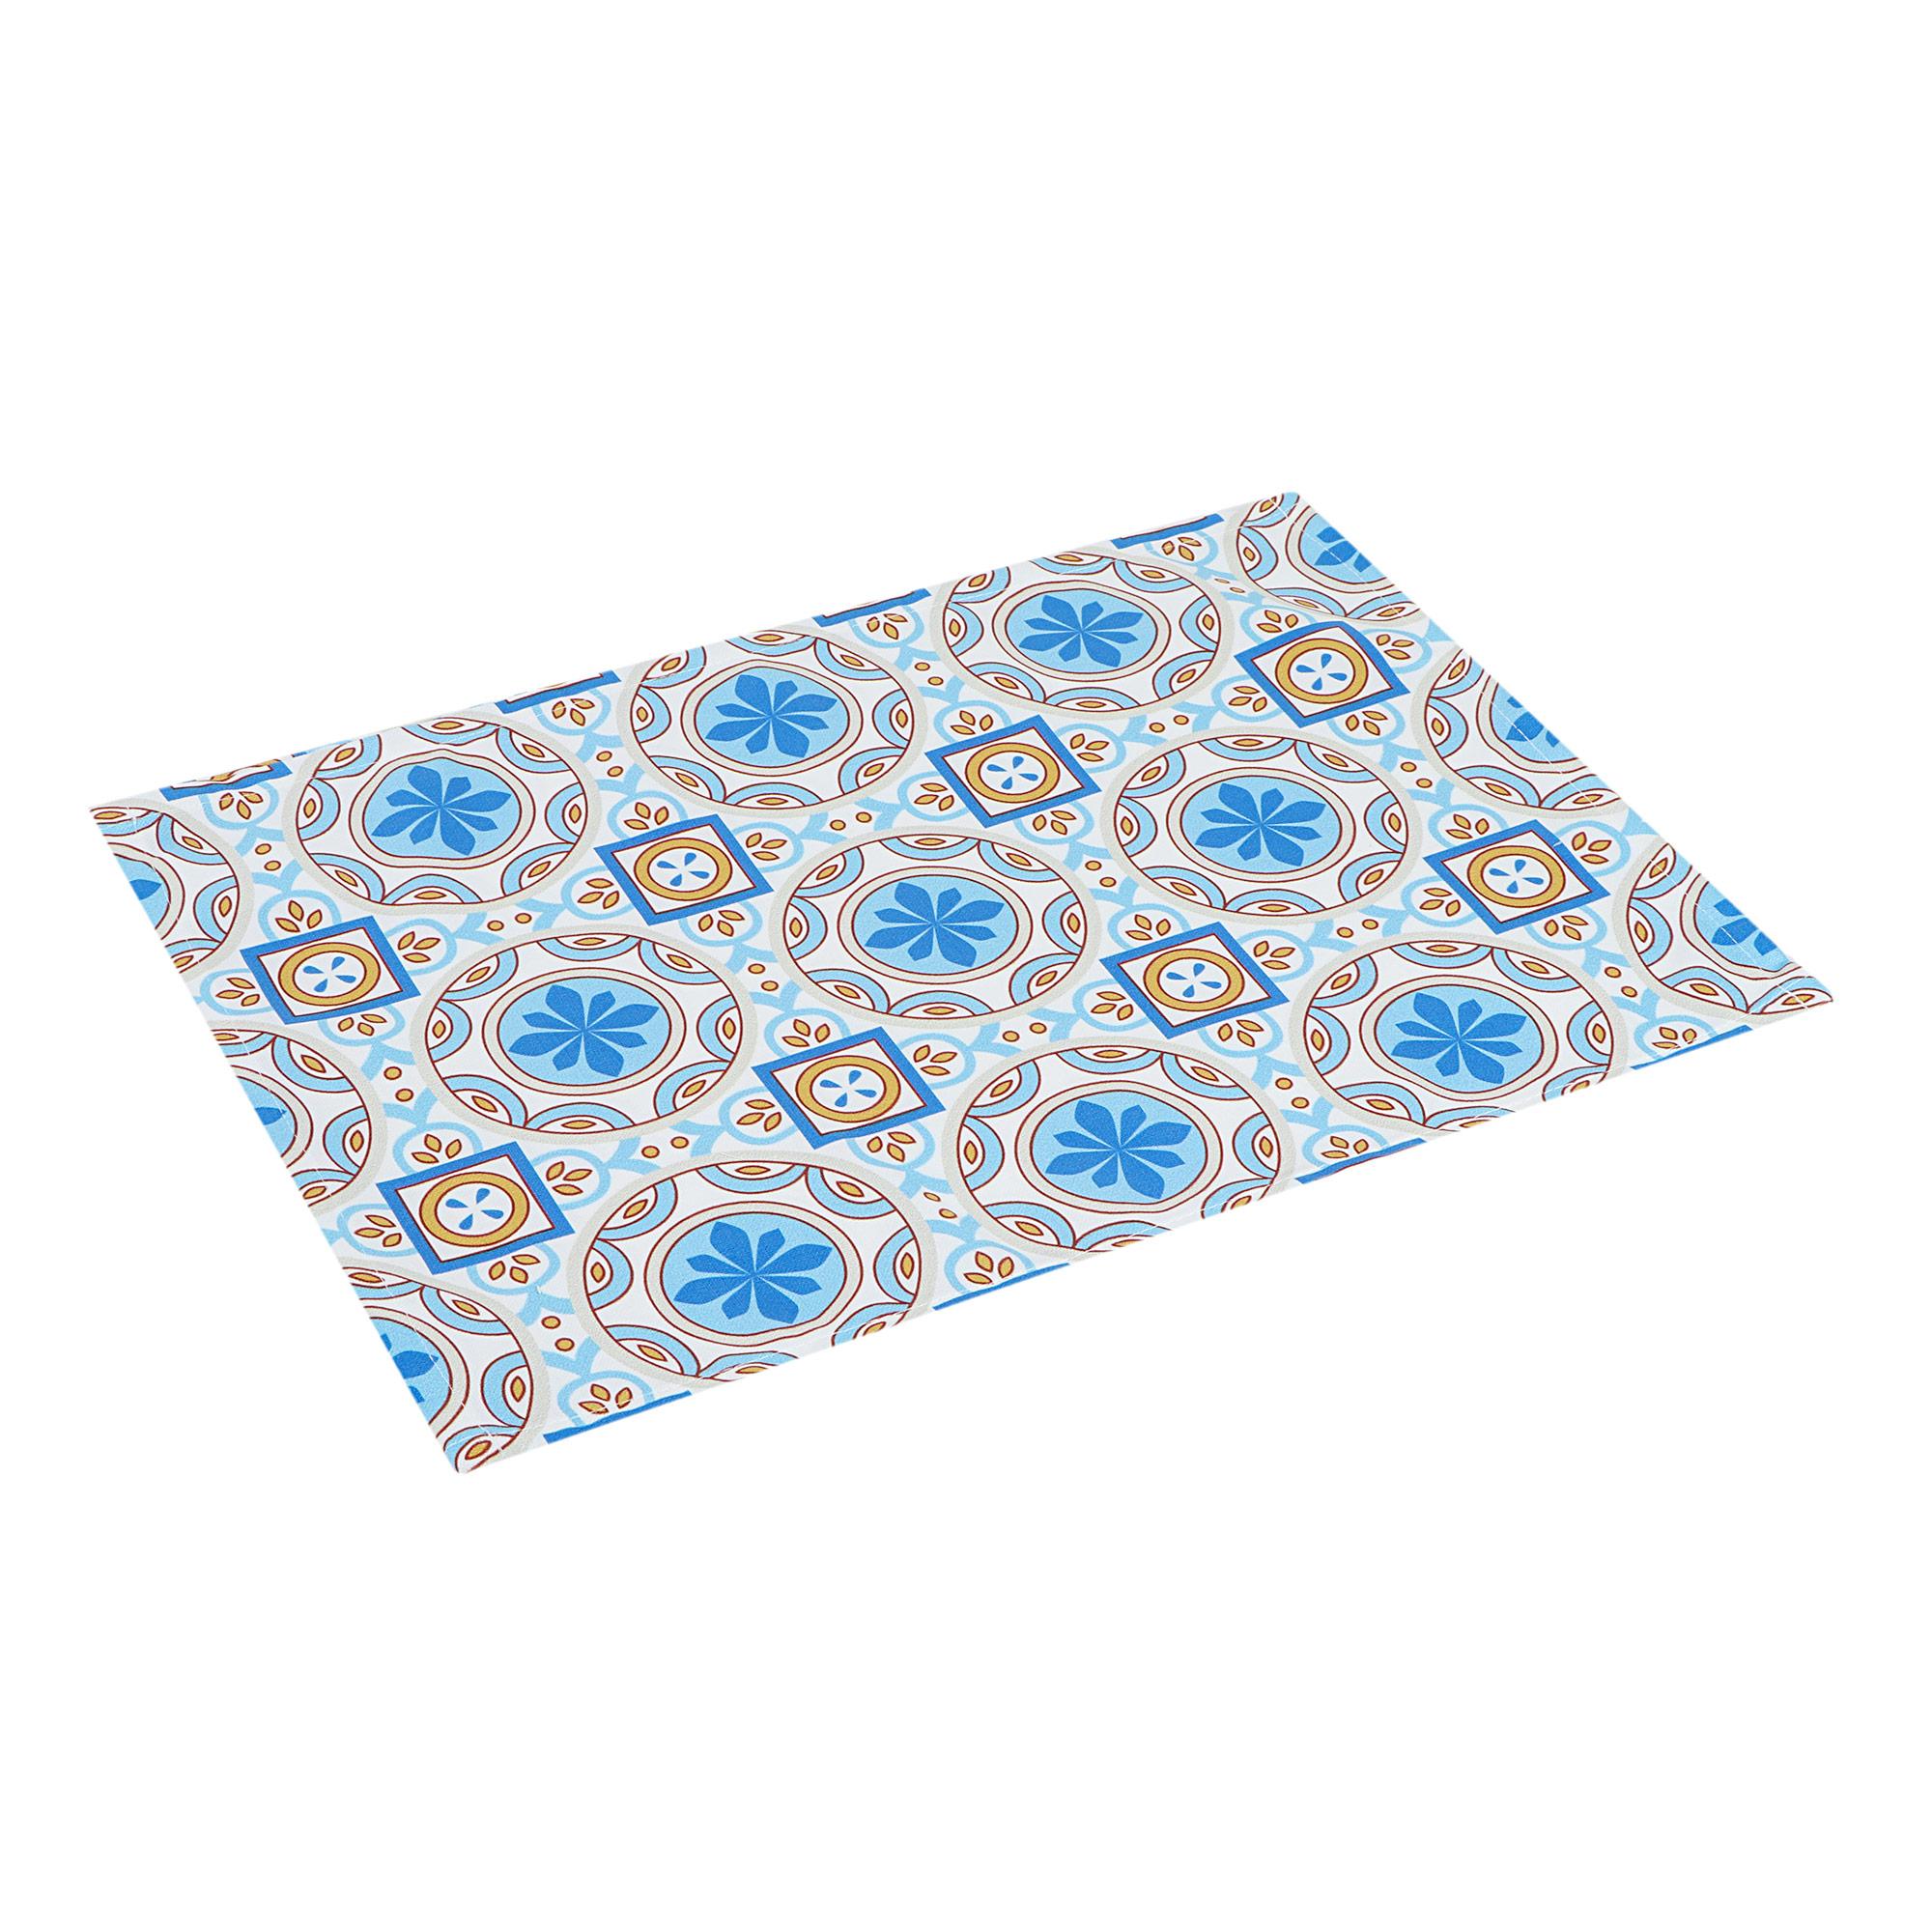 Сервировочная салфетка 33х45 2 шт Morocco style сервировочная салфетка 33х45 2 шт morocco style